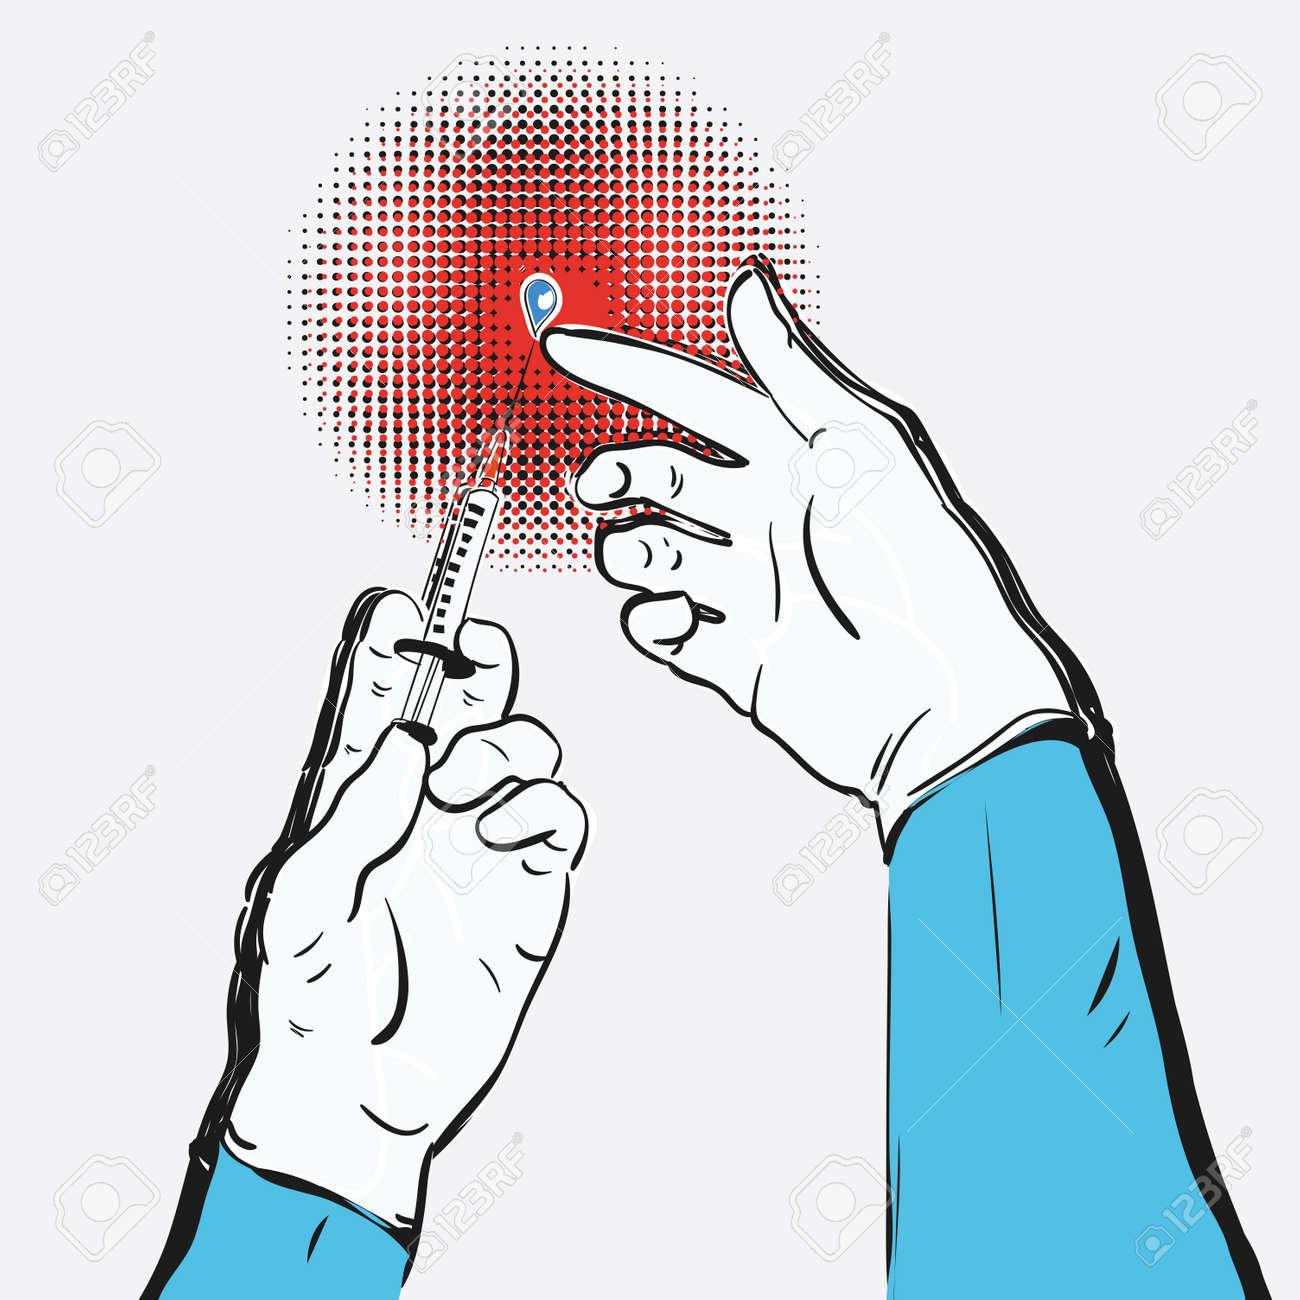 Hands holding or showing medical syringe vector illustration freehand drawing - 163540625